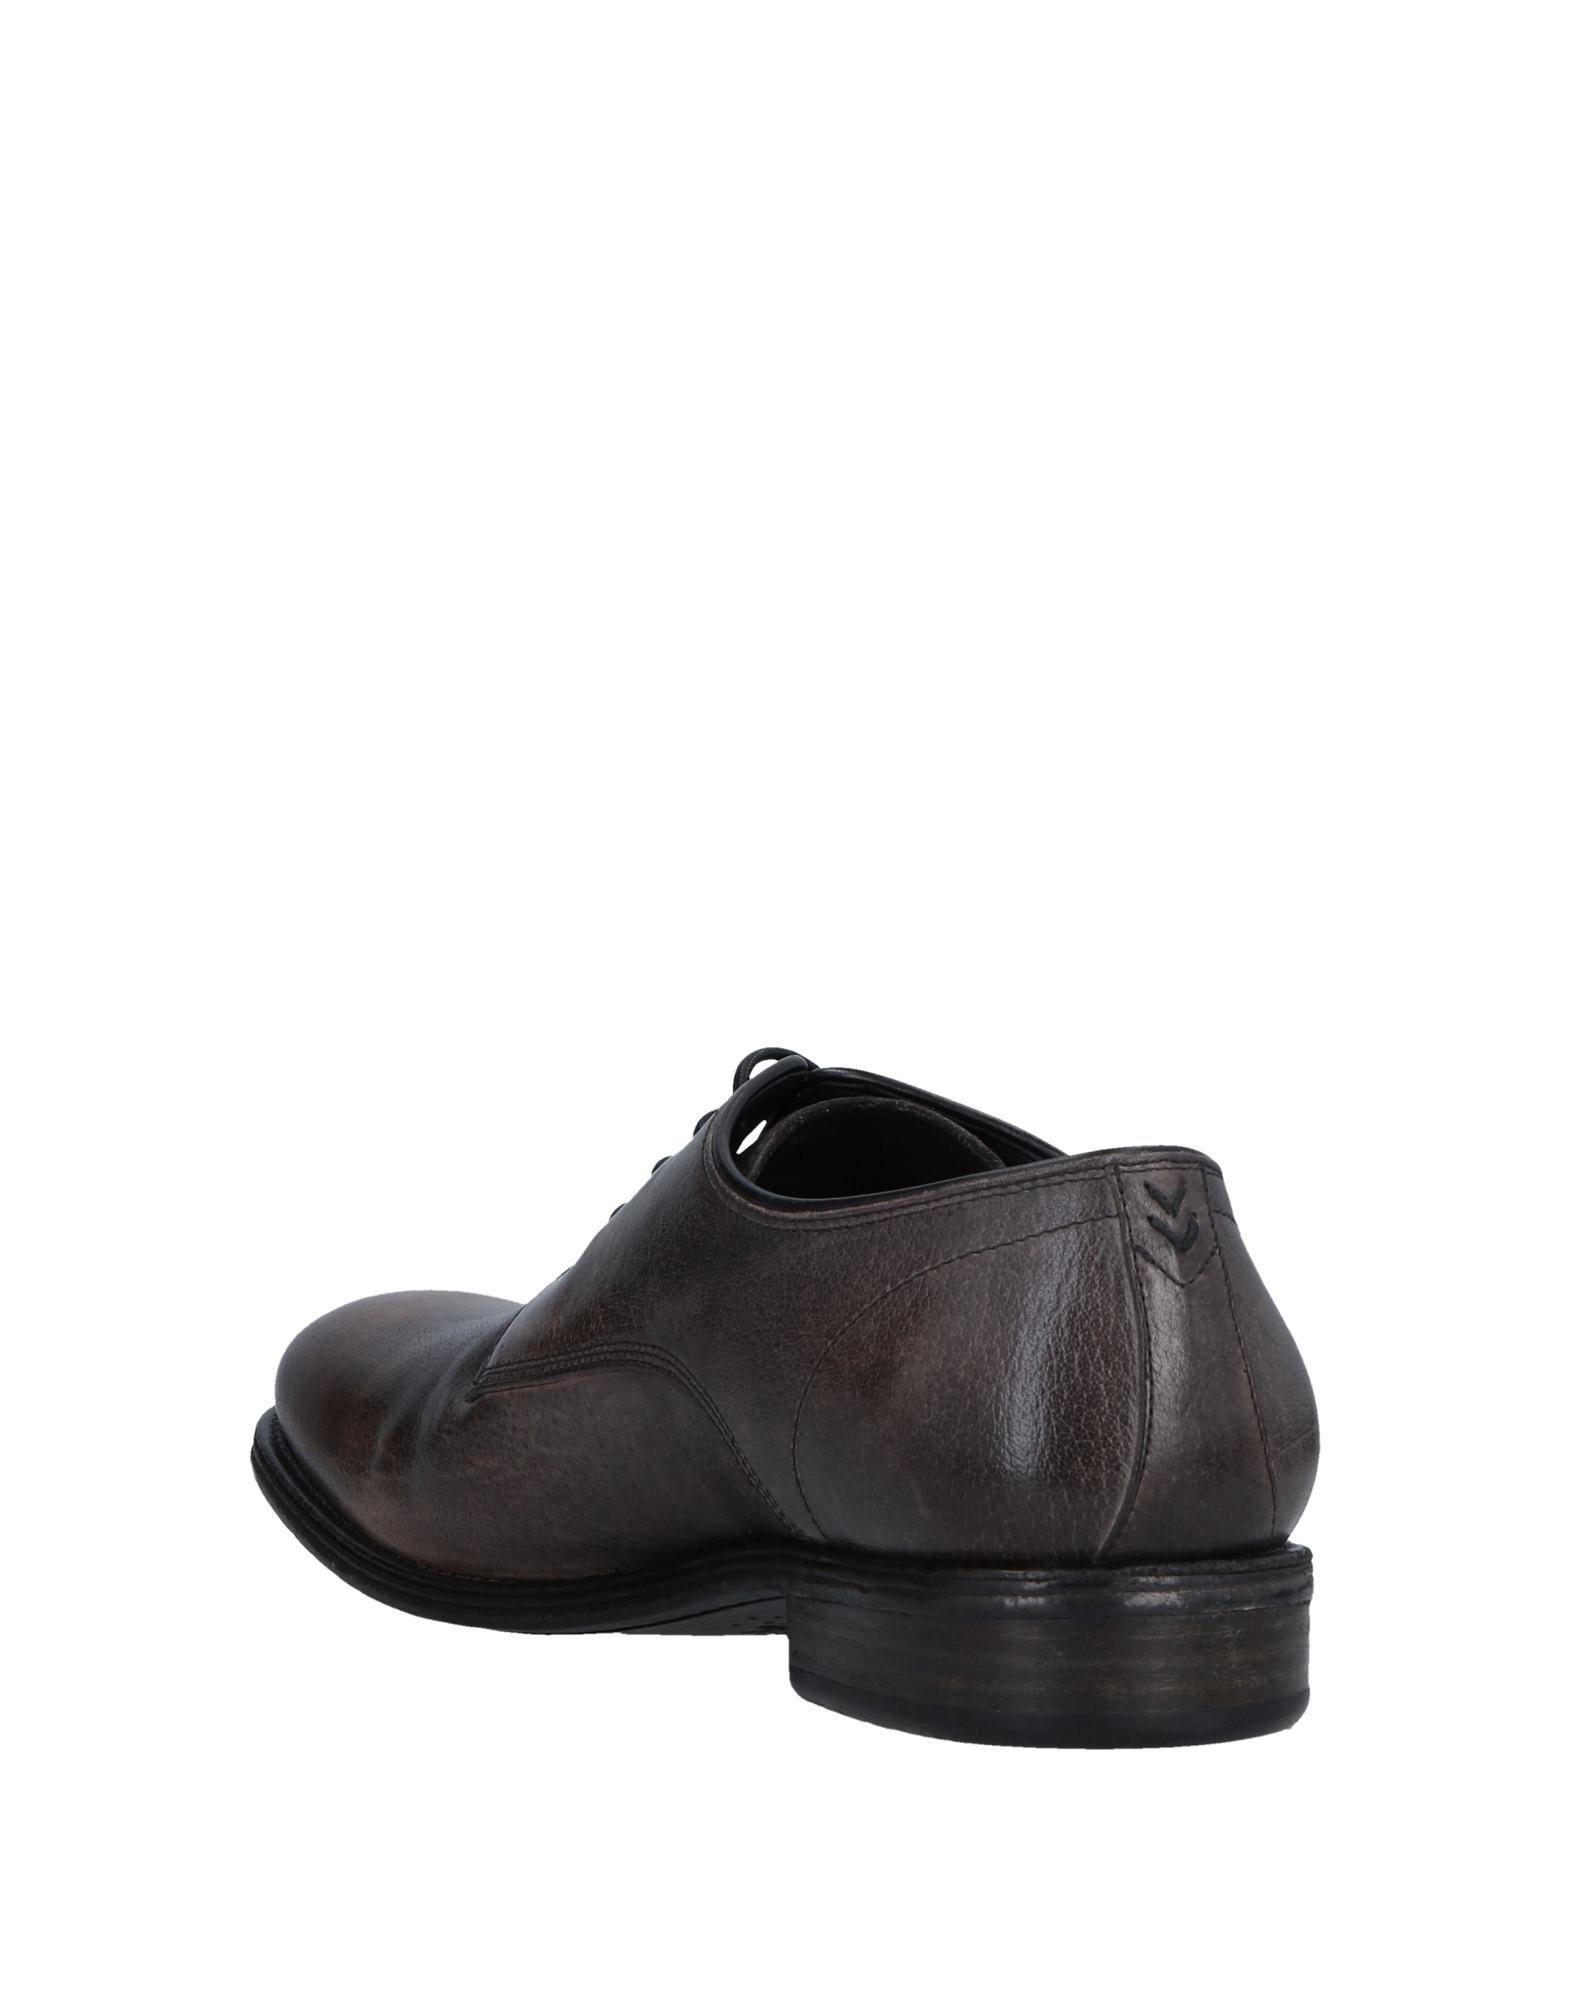 John Varvatos Schnürschuhe Herren  Schuhe 11536043HH Gute Qualität beliebte Schuhe  f387f4